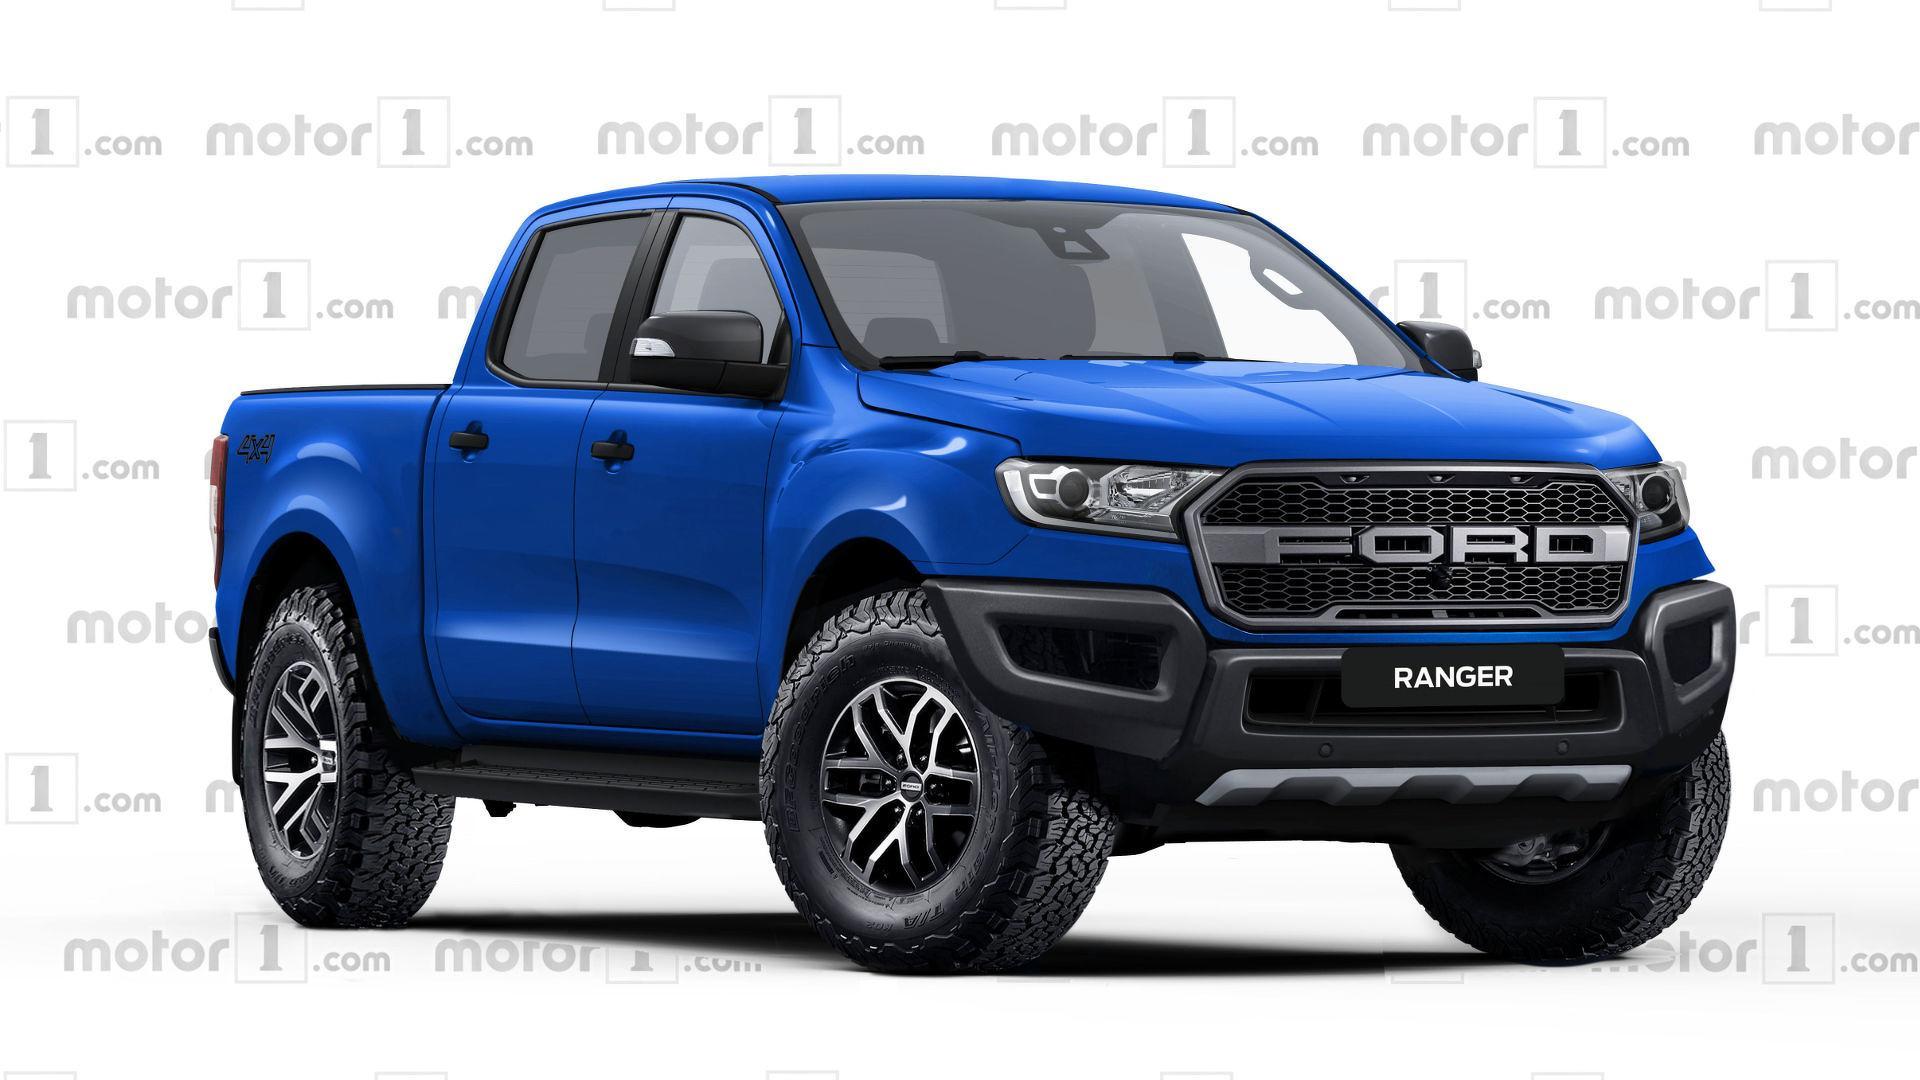 2017 Trucks Worth Waiting For >> 20 Future Trucks And SUVs Worth Waiting For